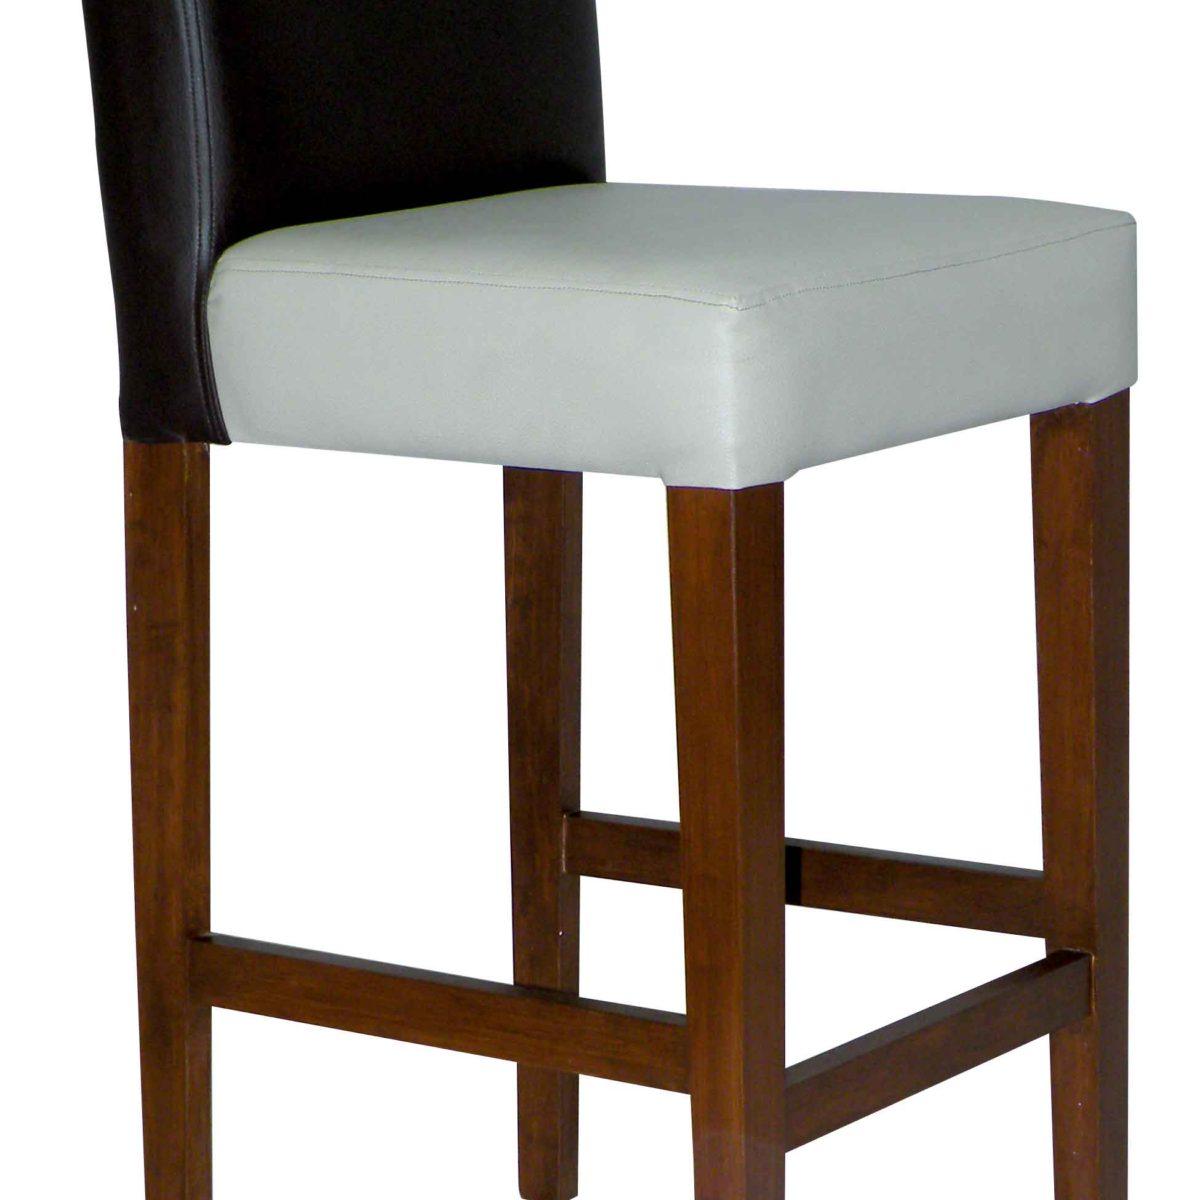 silla restaurante ar-341